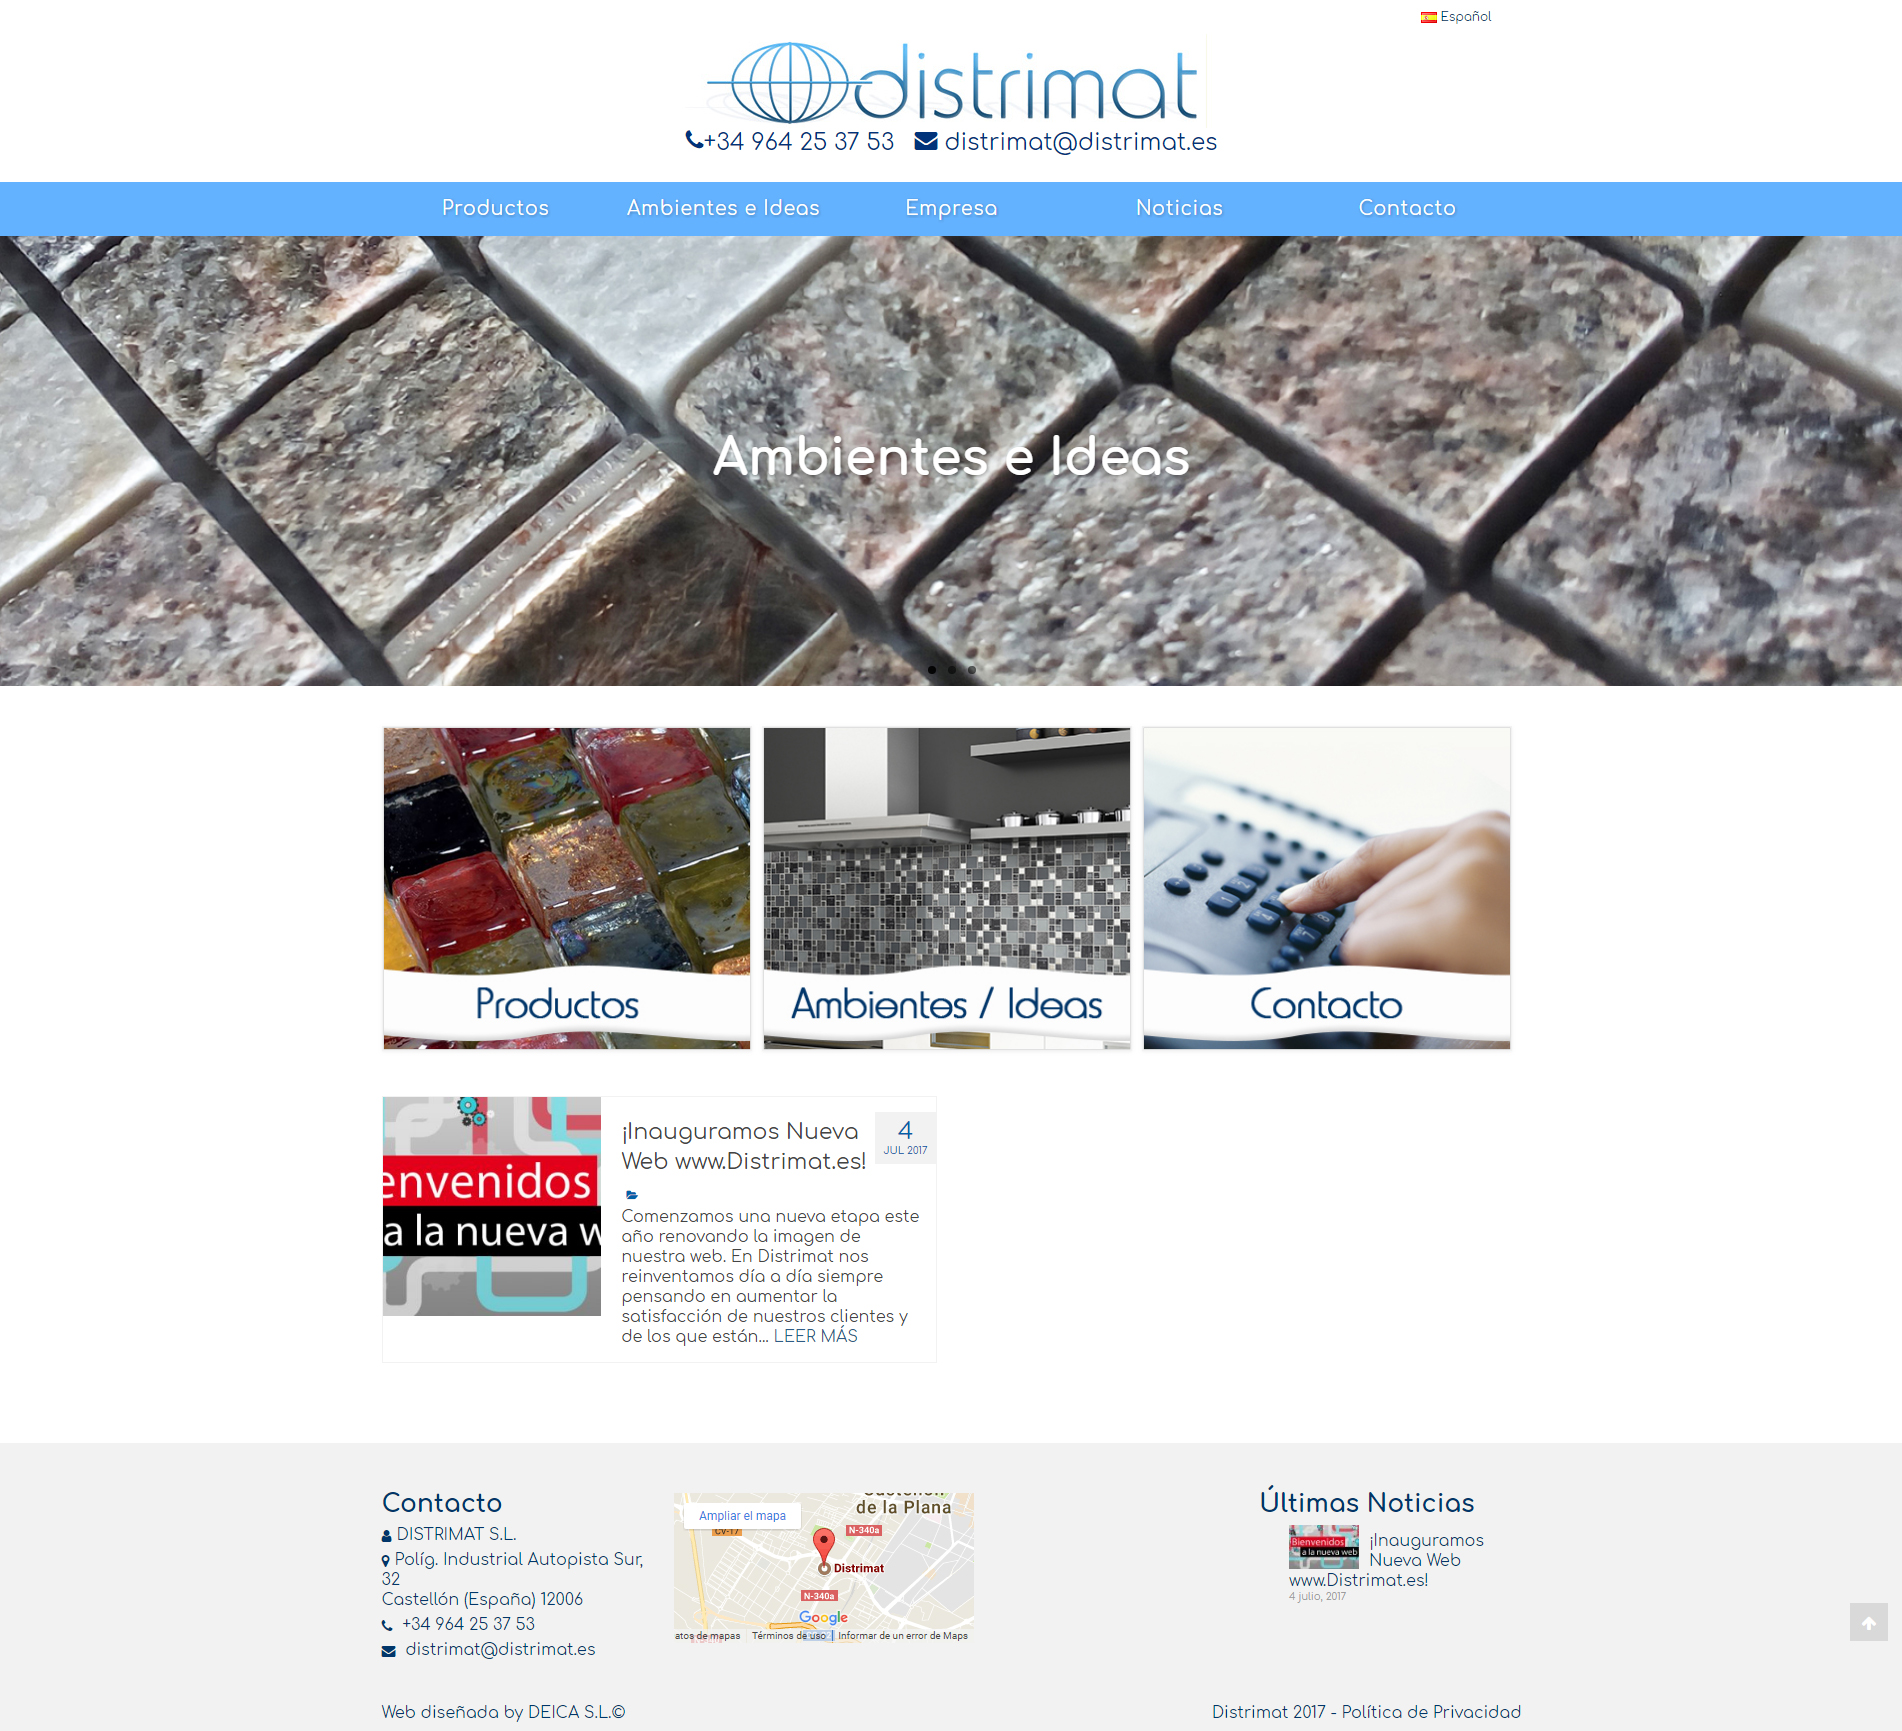 Nueva Web de Distrimat | www.distrimat.es con +Catalogo +Autoadministrable +Móvil +Multi-idioma